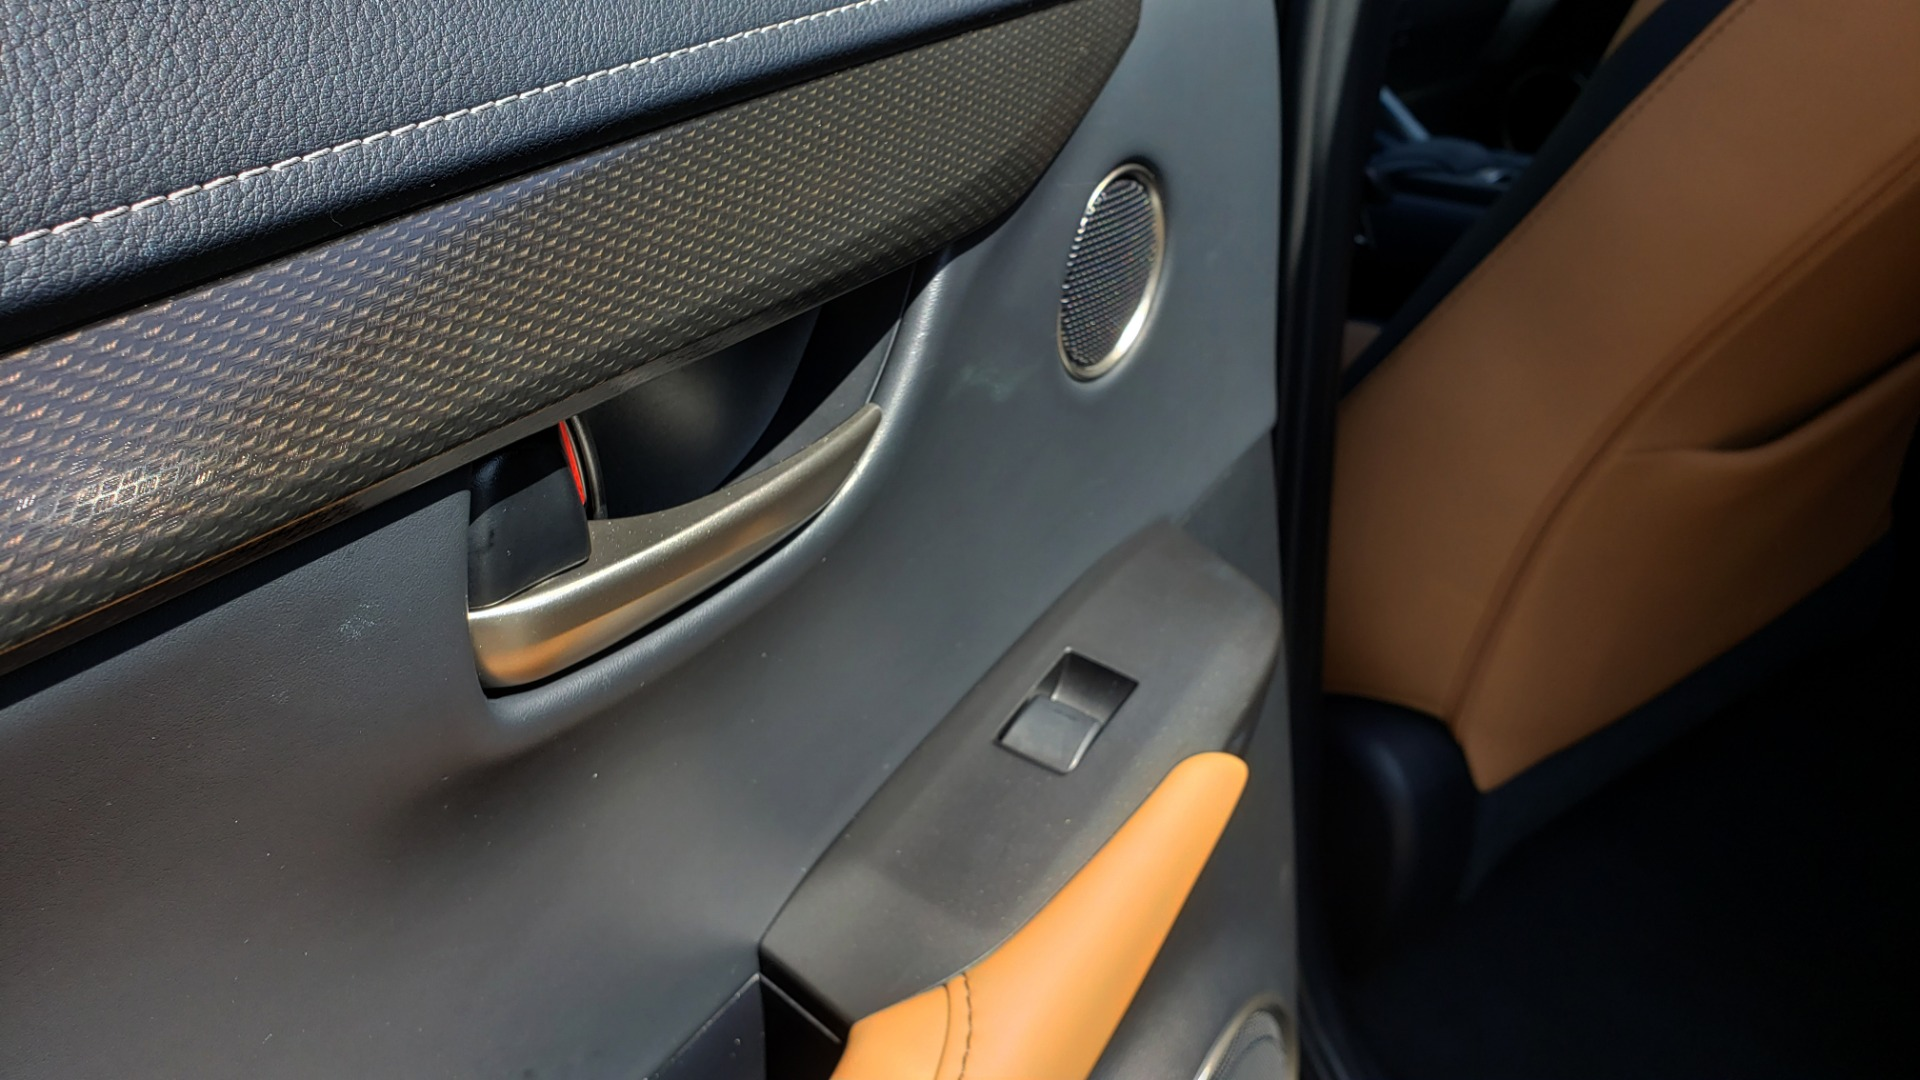 Used 2016 Lexus NX 200T PREM PKG / NAV / SUNROOF / PRE-COLLISION / PARK ASST for sale Sold at Formula Imports in Charlotte NC 28227 57